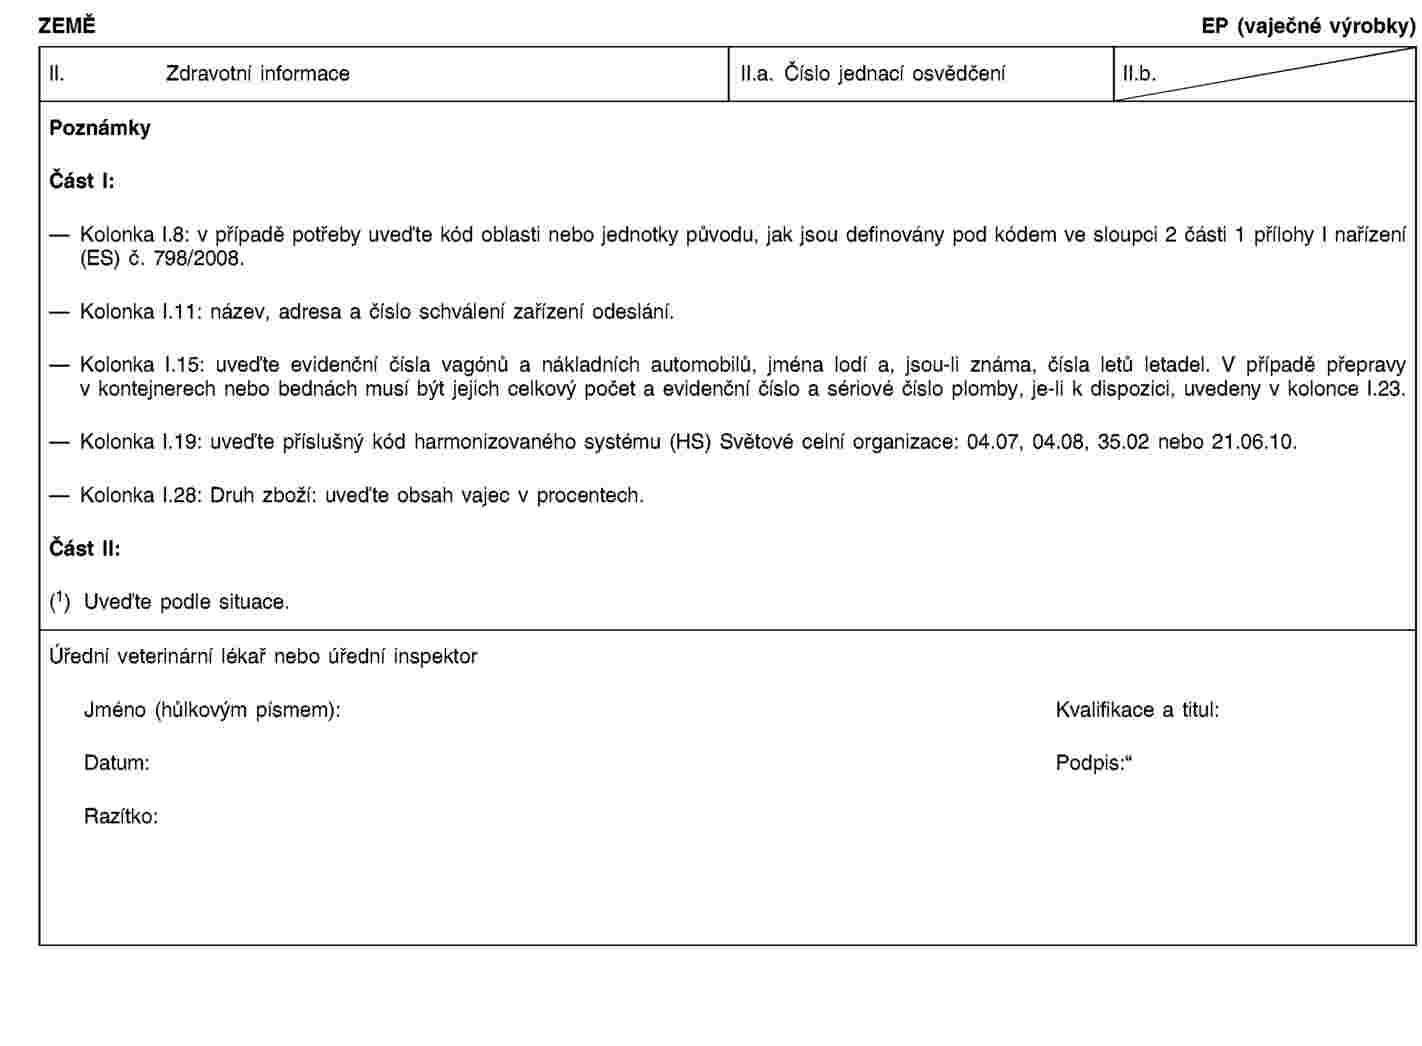 EUR-Lex - 32011R0364 - EN - EUR-Lex